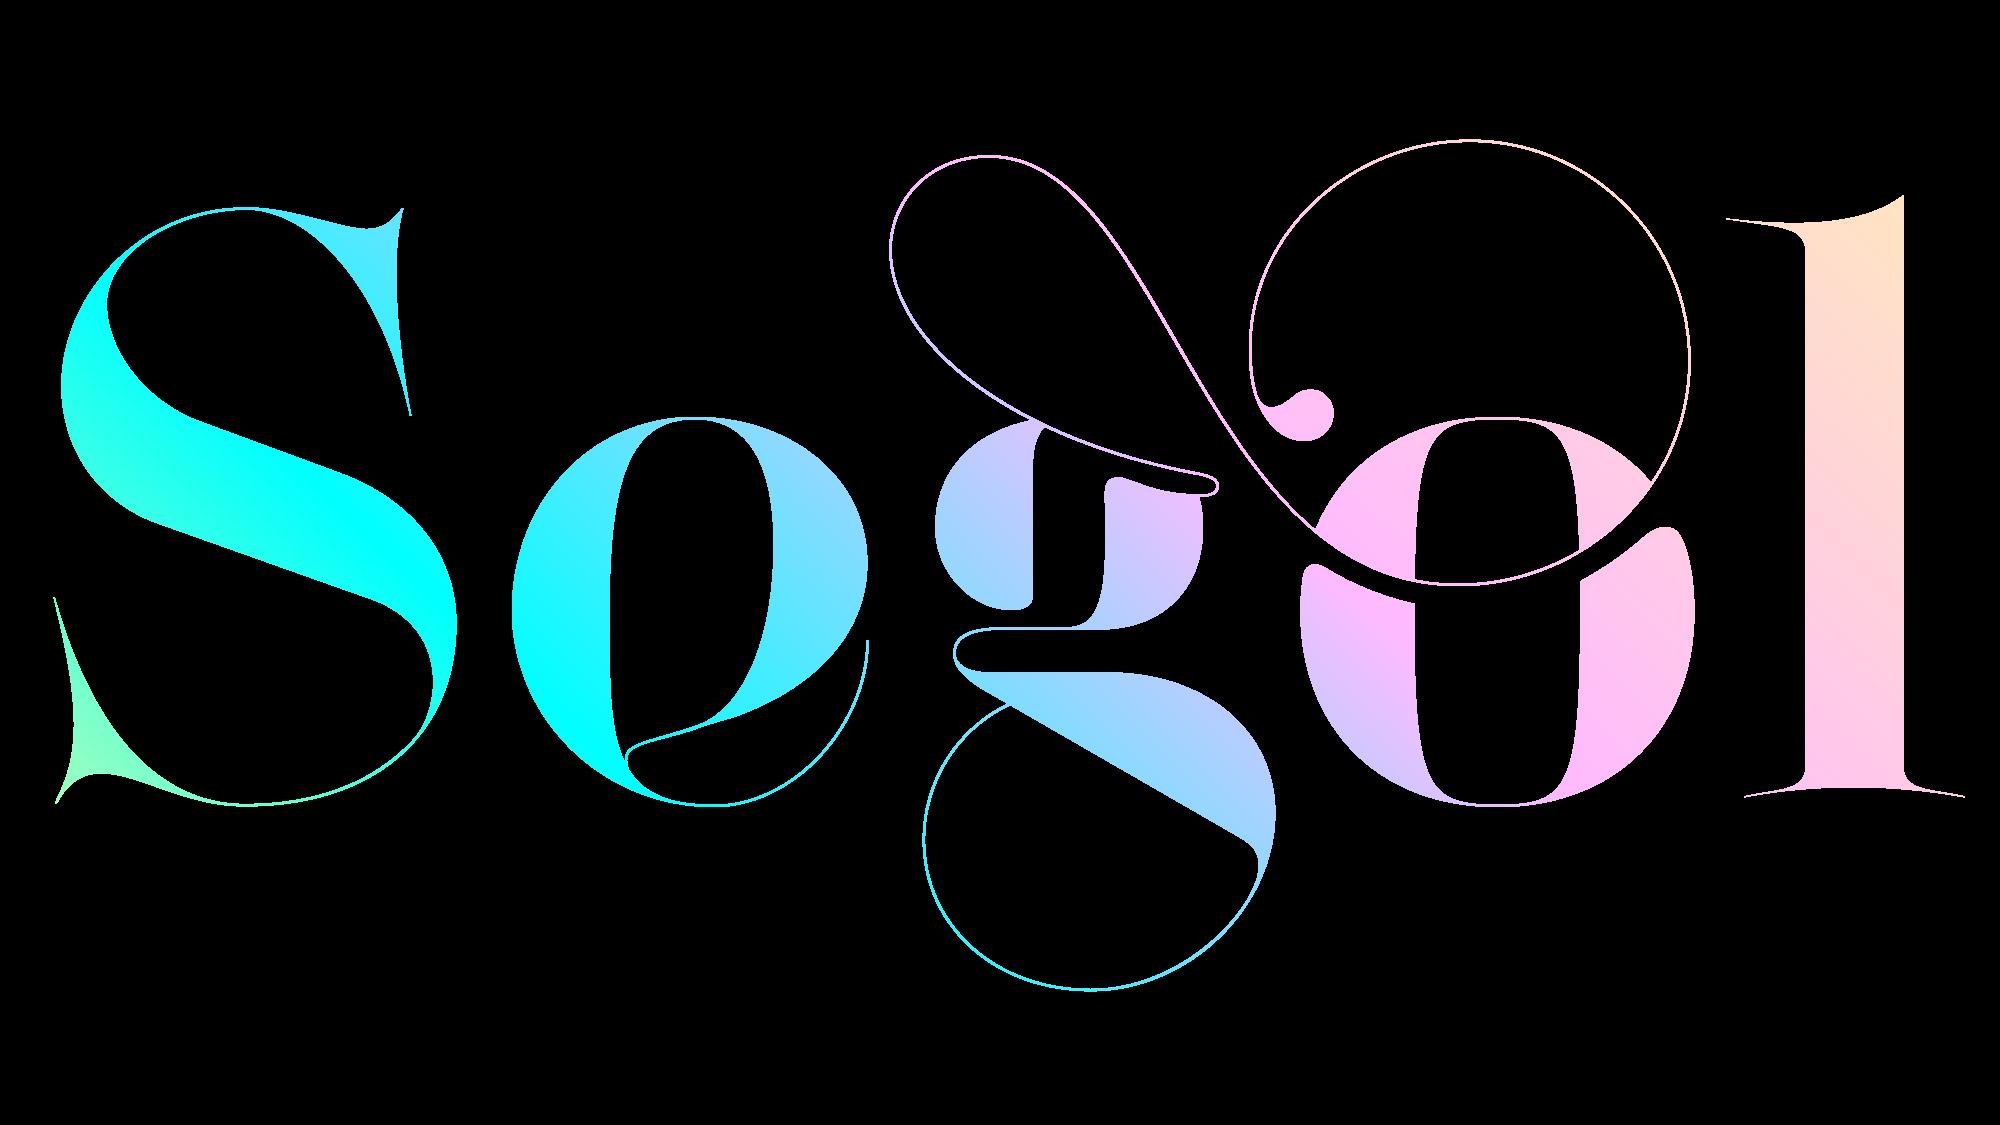 Segol Typeface